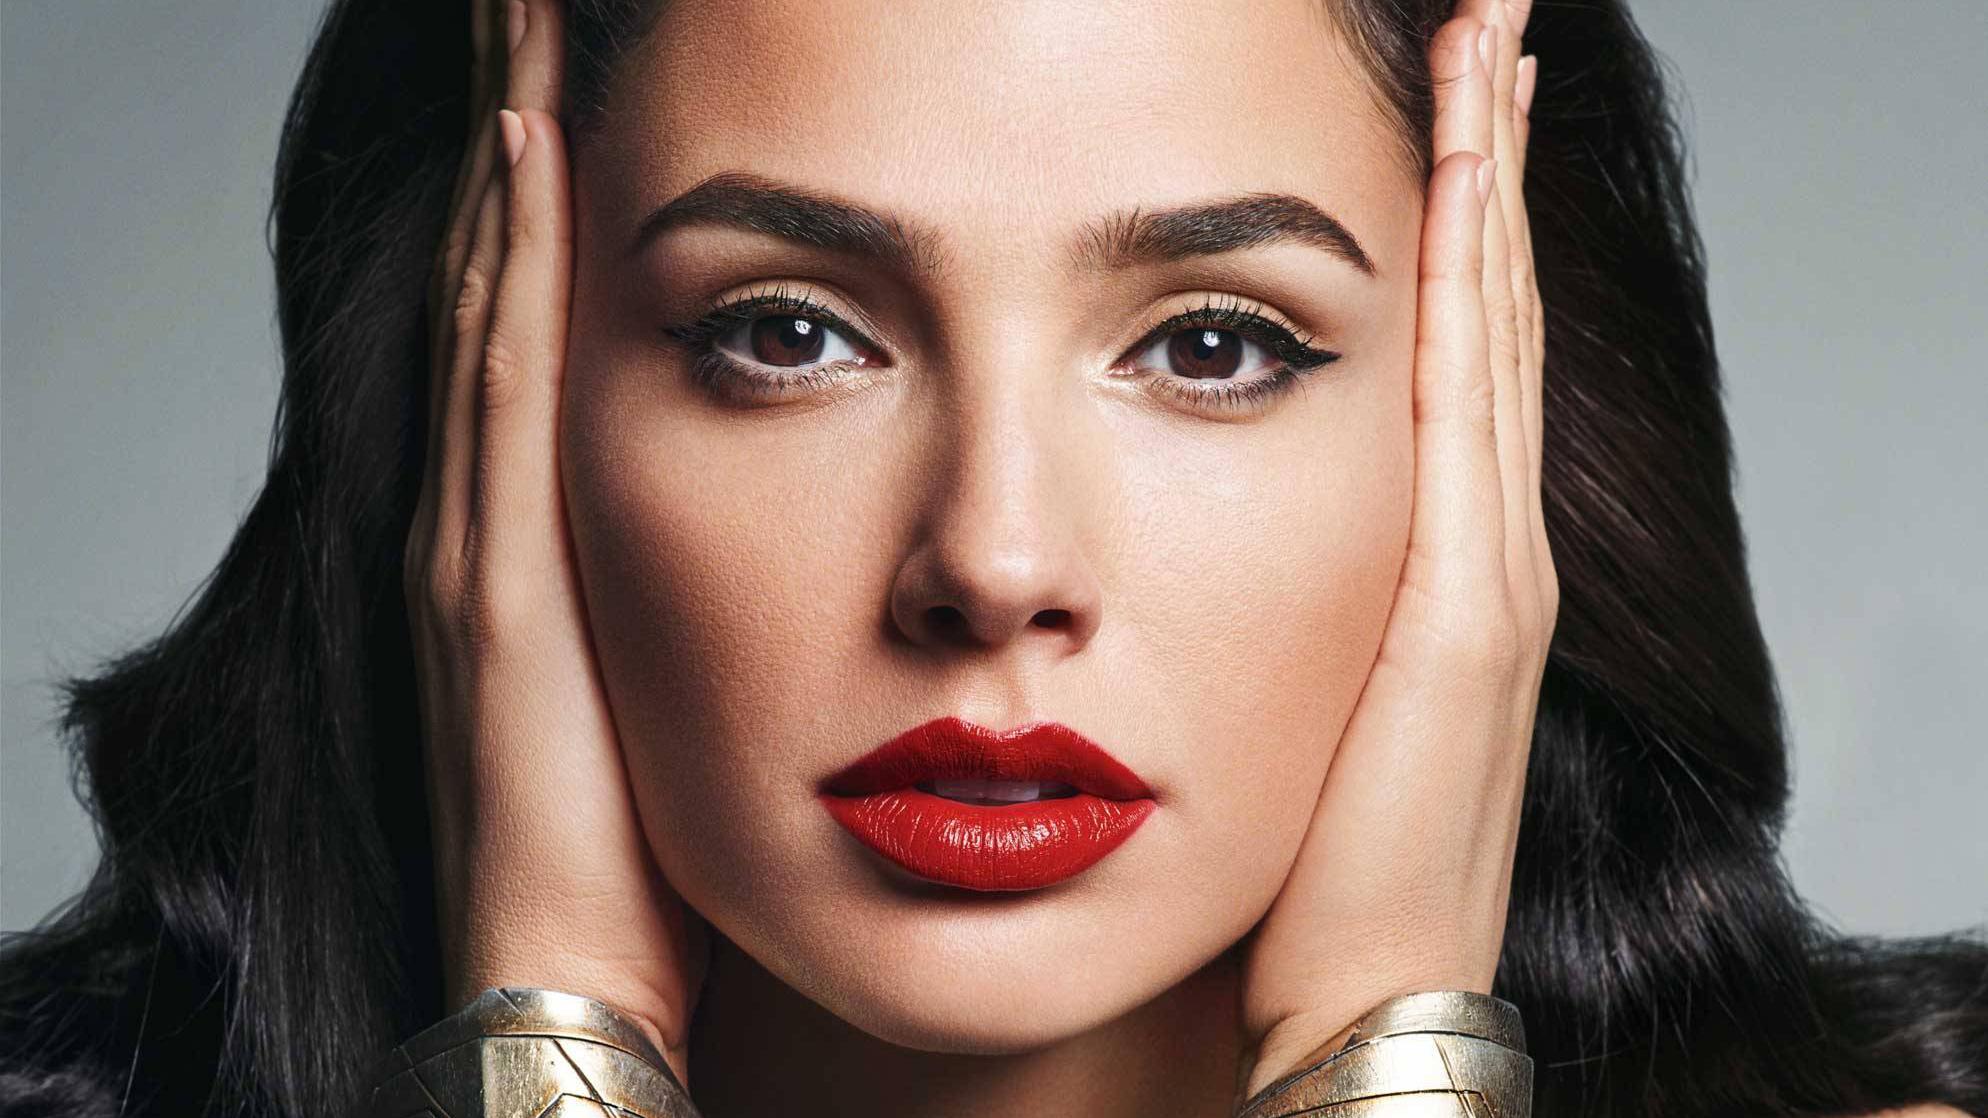 Gal Gadot As Wonder Woman New Hd Movies 4k Wallpapers Images